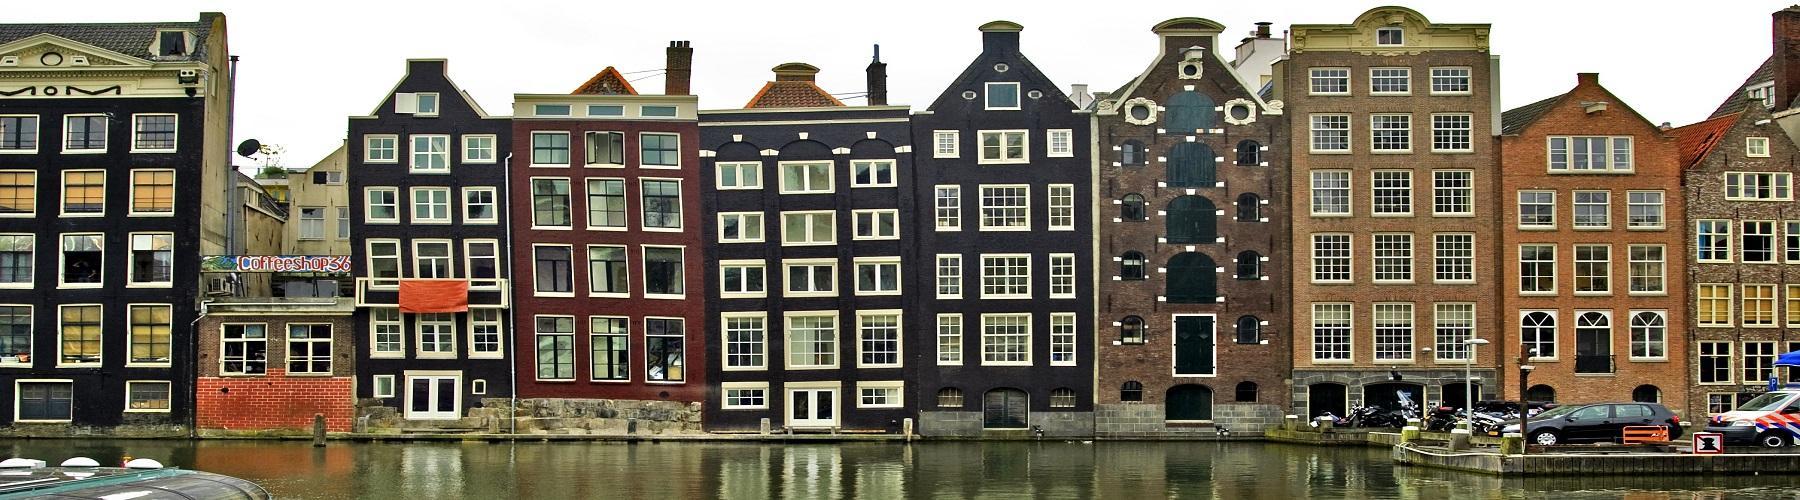 Амстердам Нидерланды